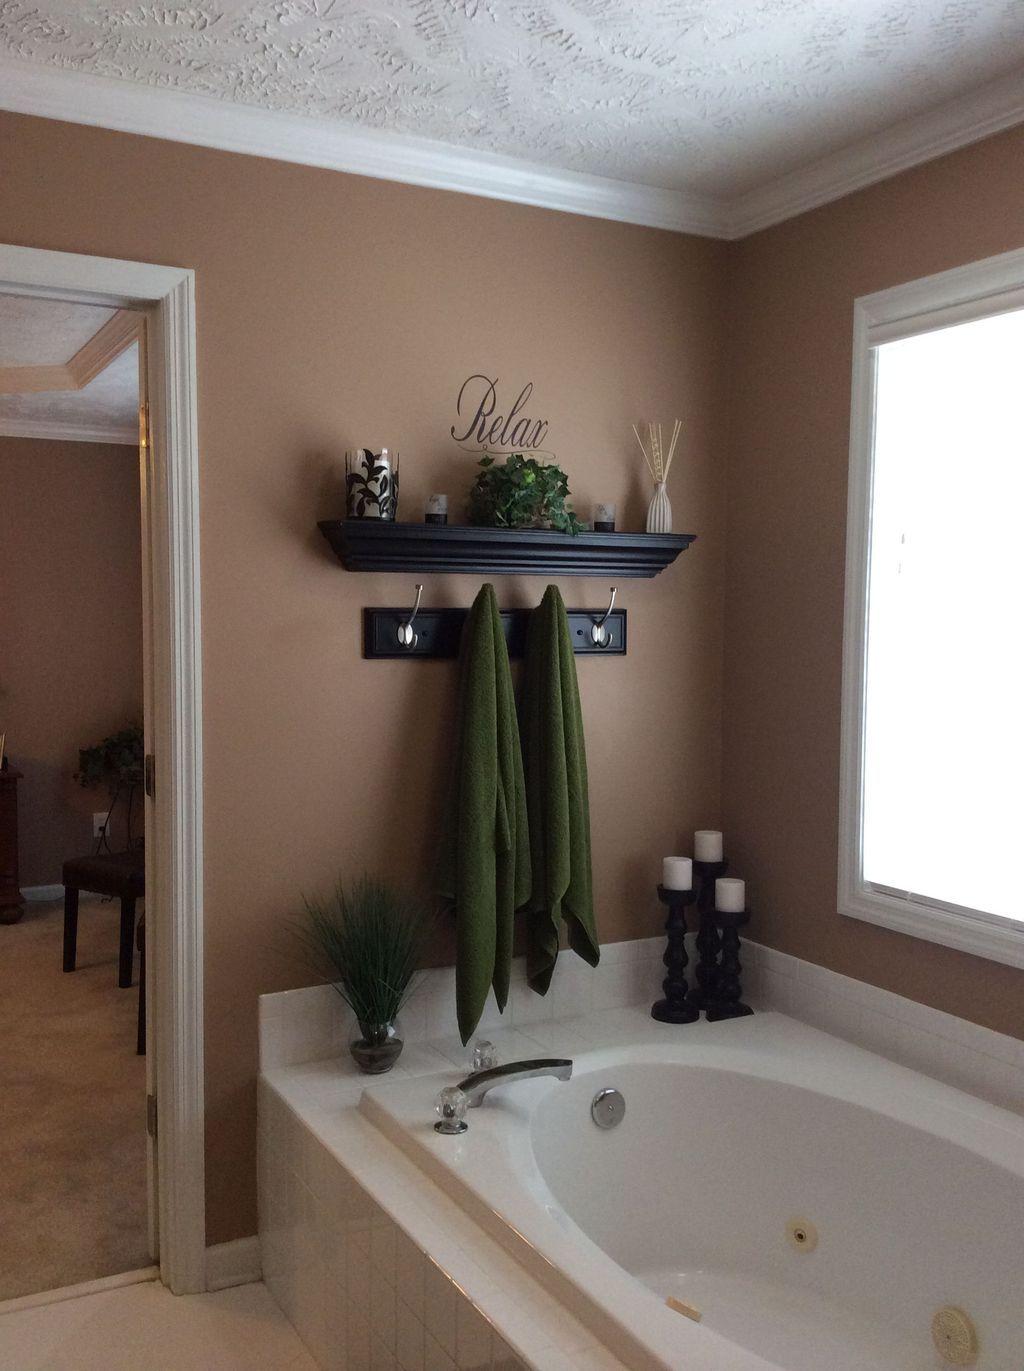 20 Totally Adorable Garden Tub Decorating Ideas Trenduhome Restroom Decor Diy Bathroom Decor Bathtub Decor